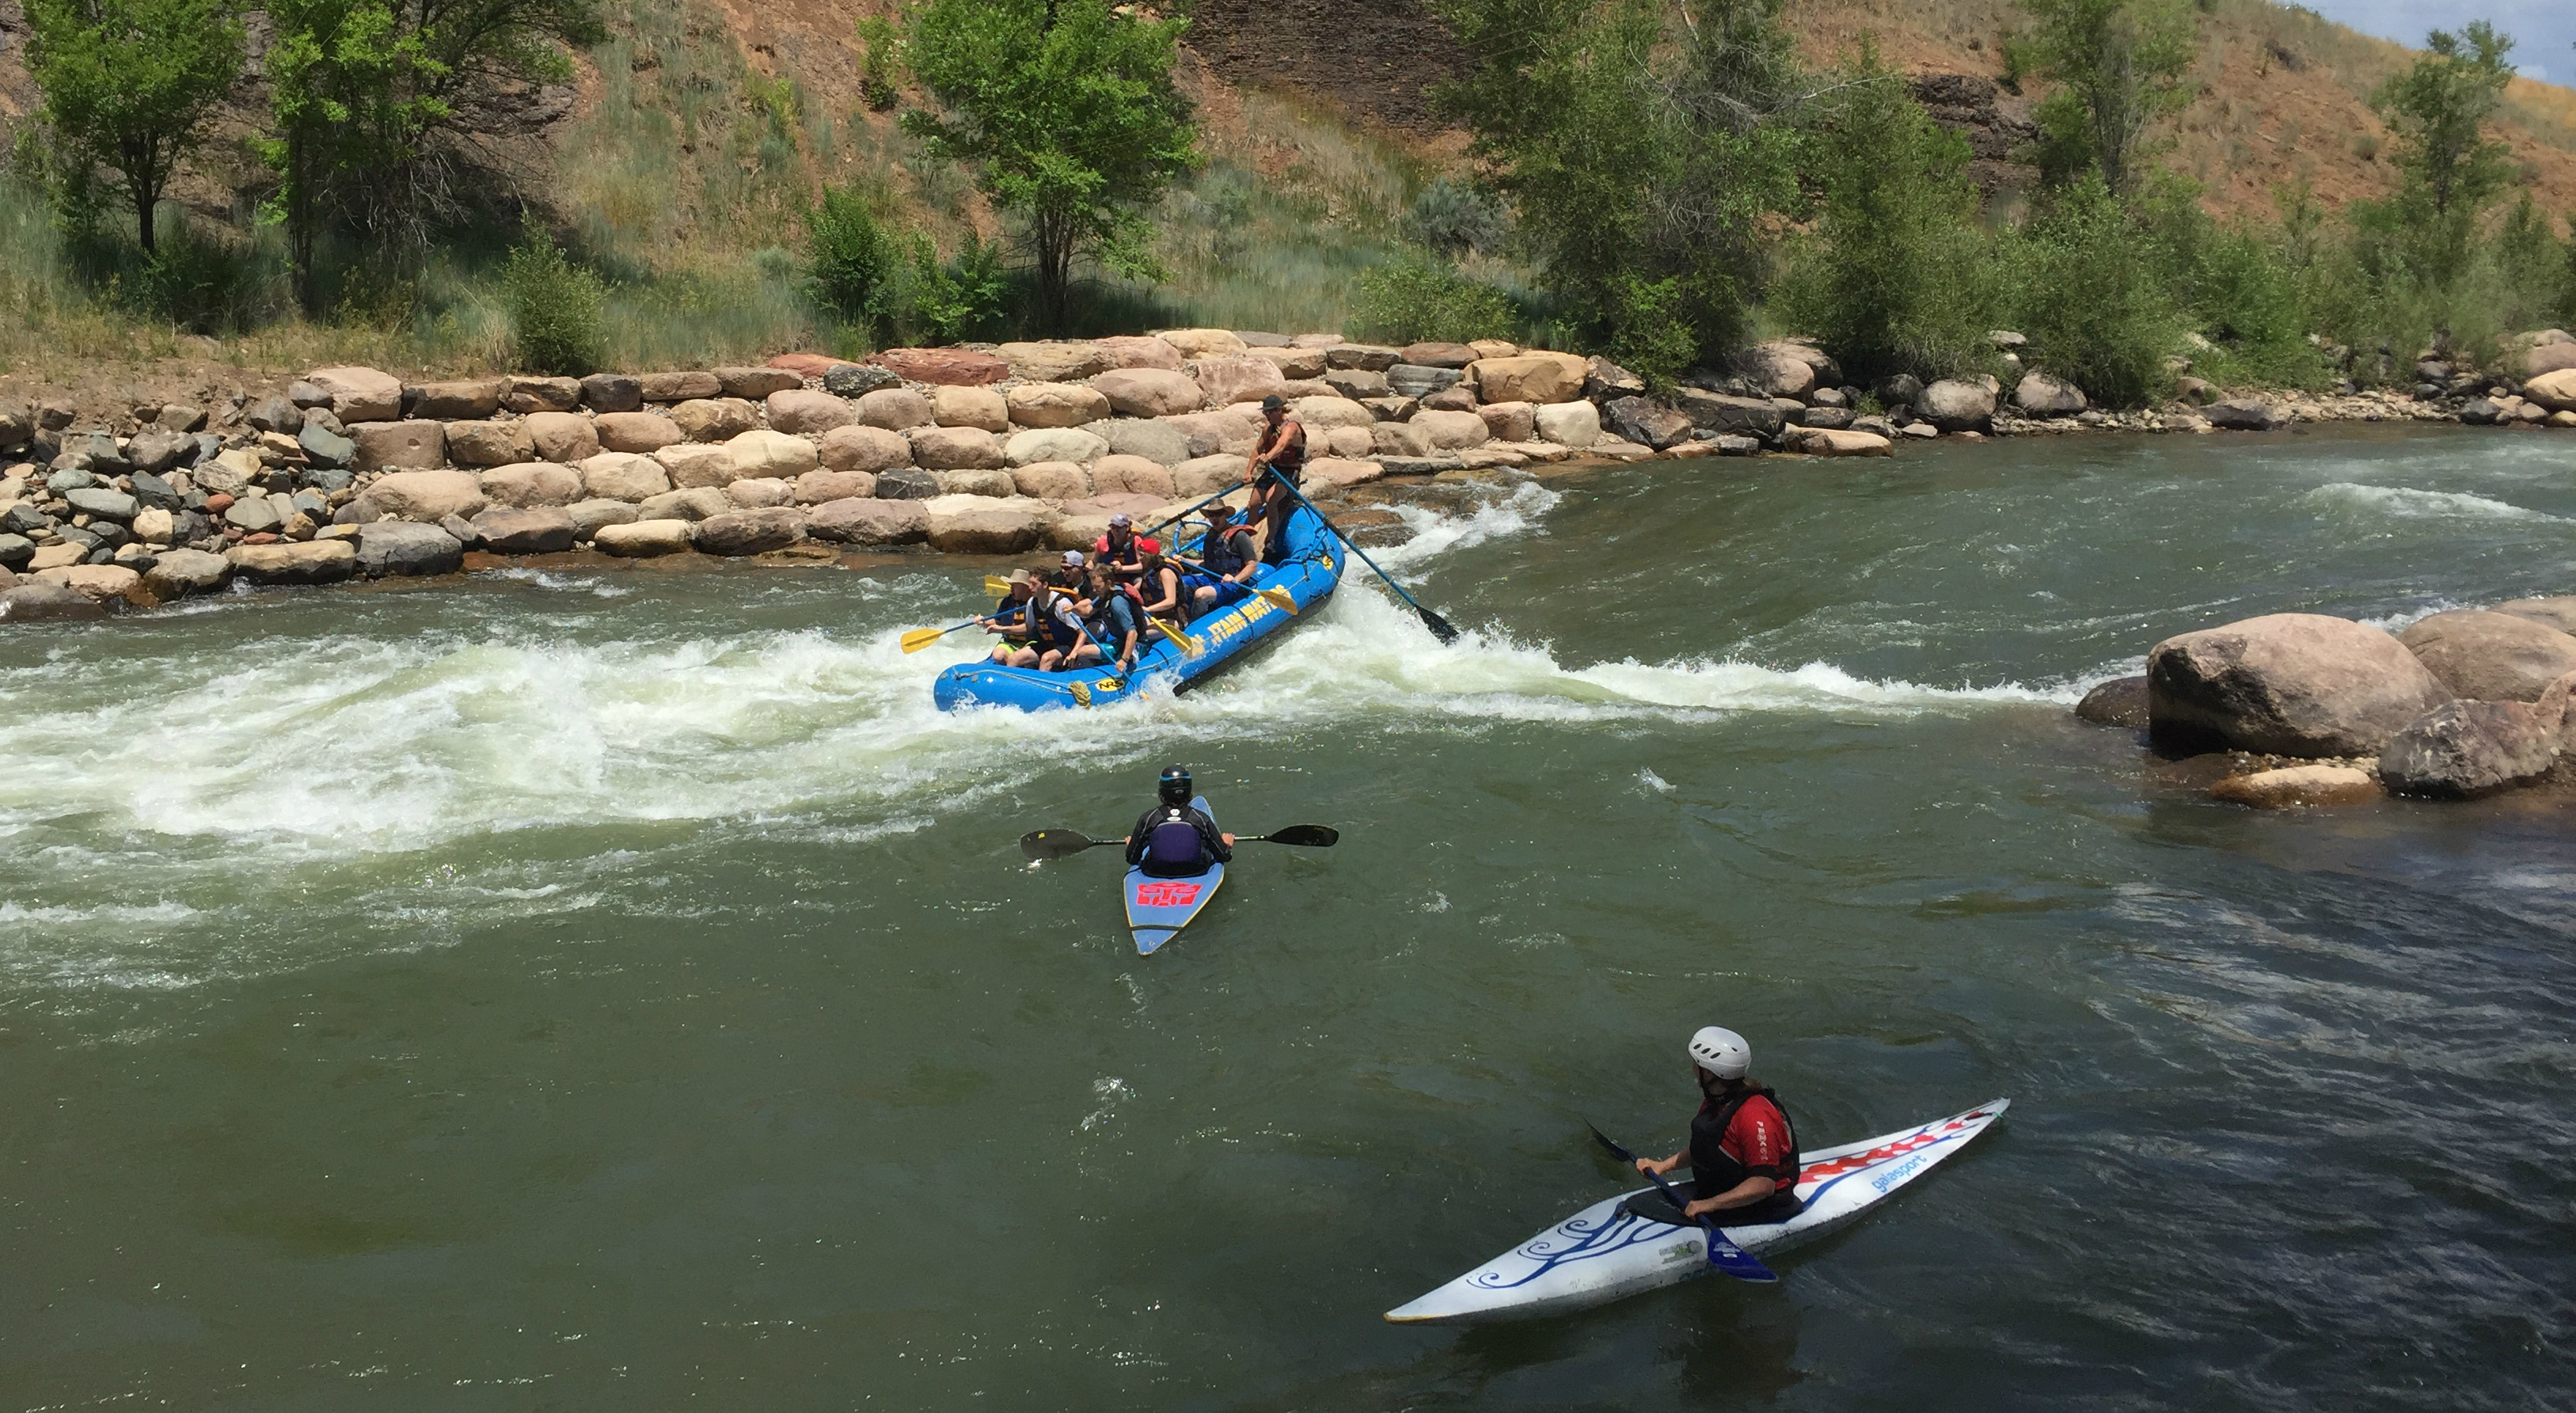 Photo: Animas River, Whitewater Rafting